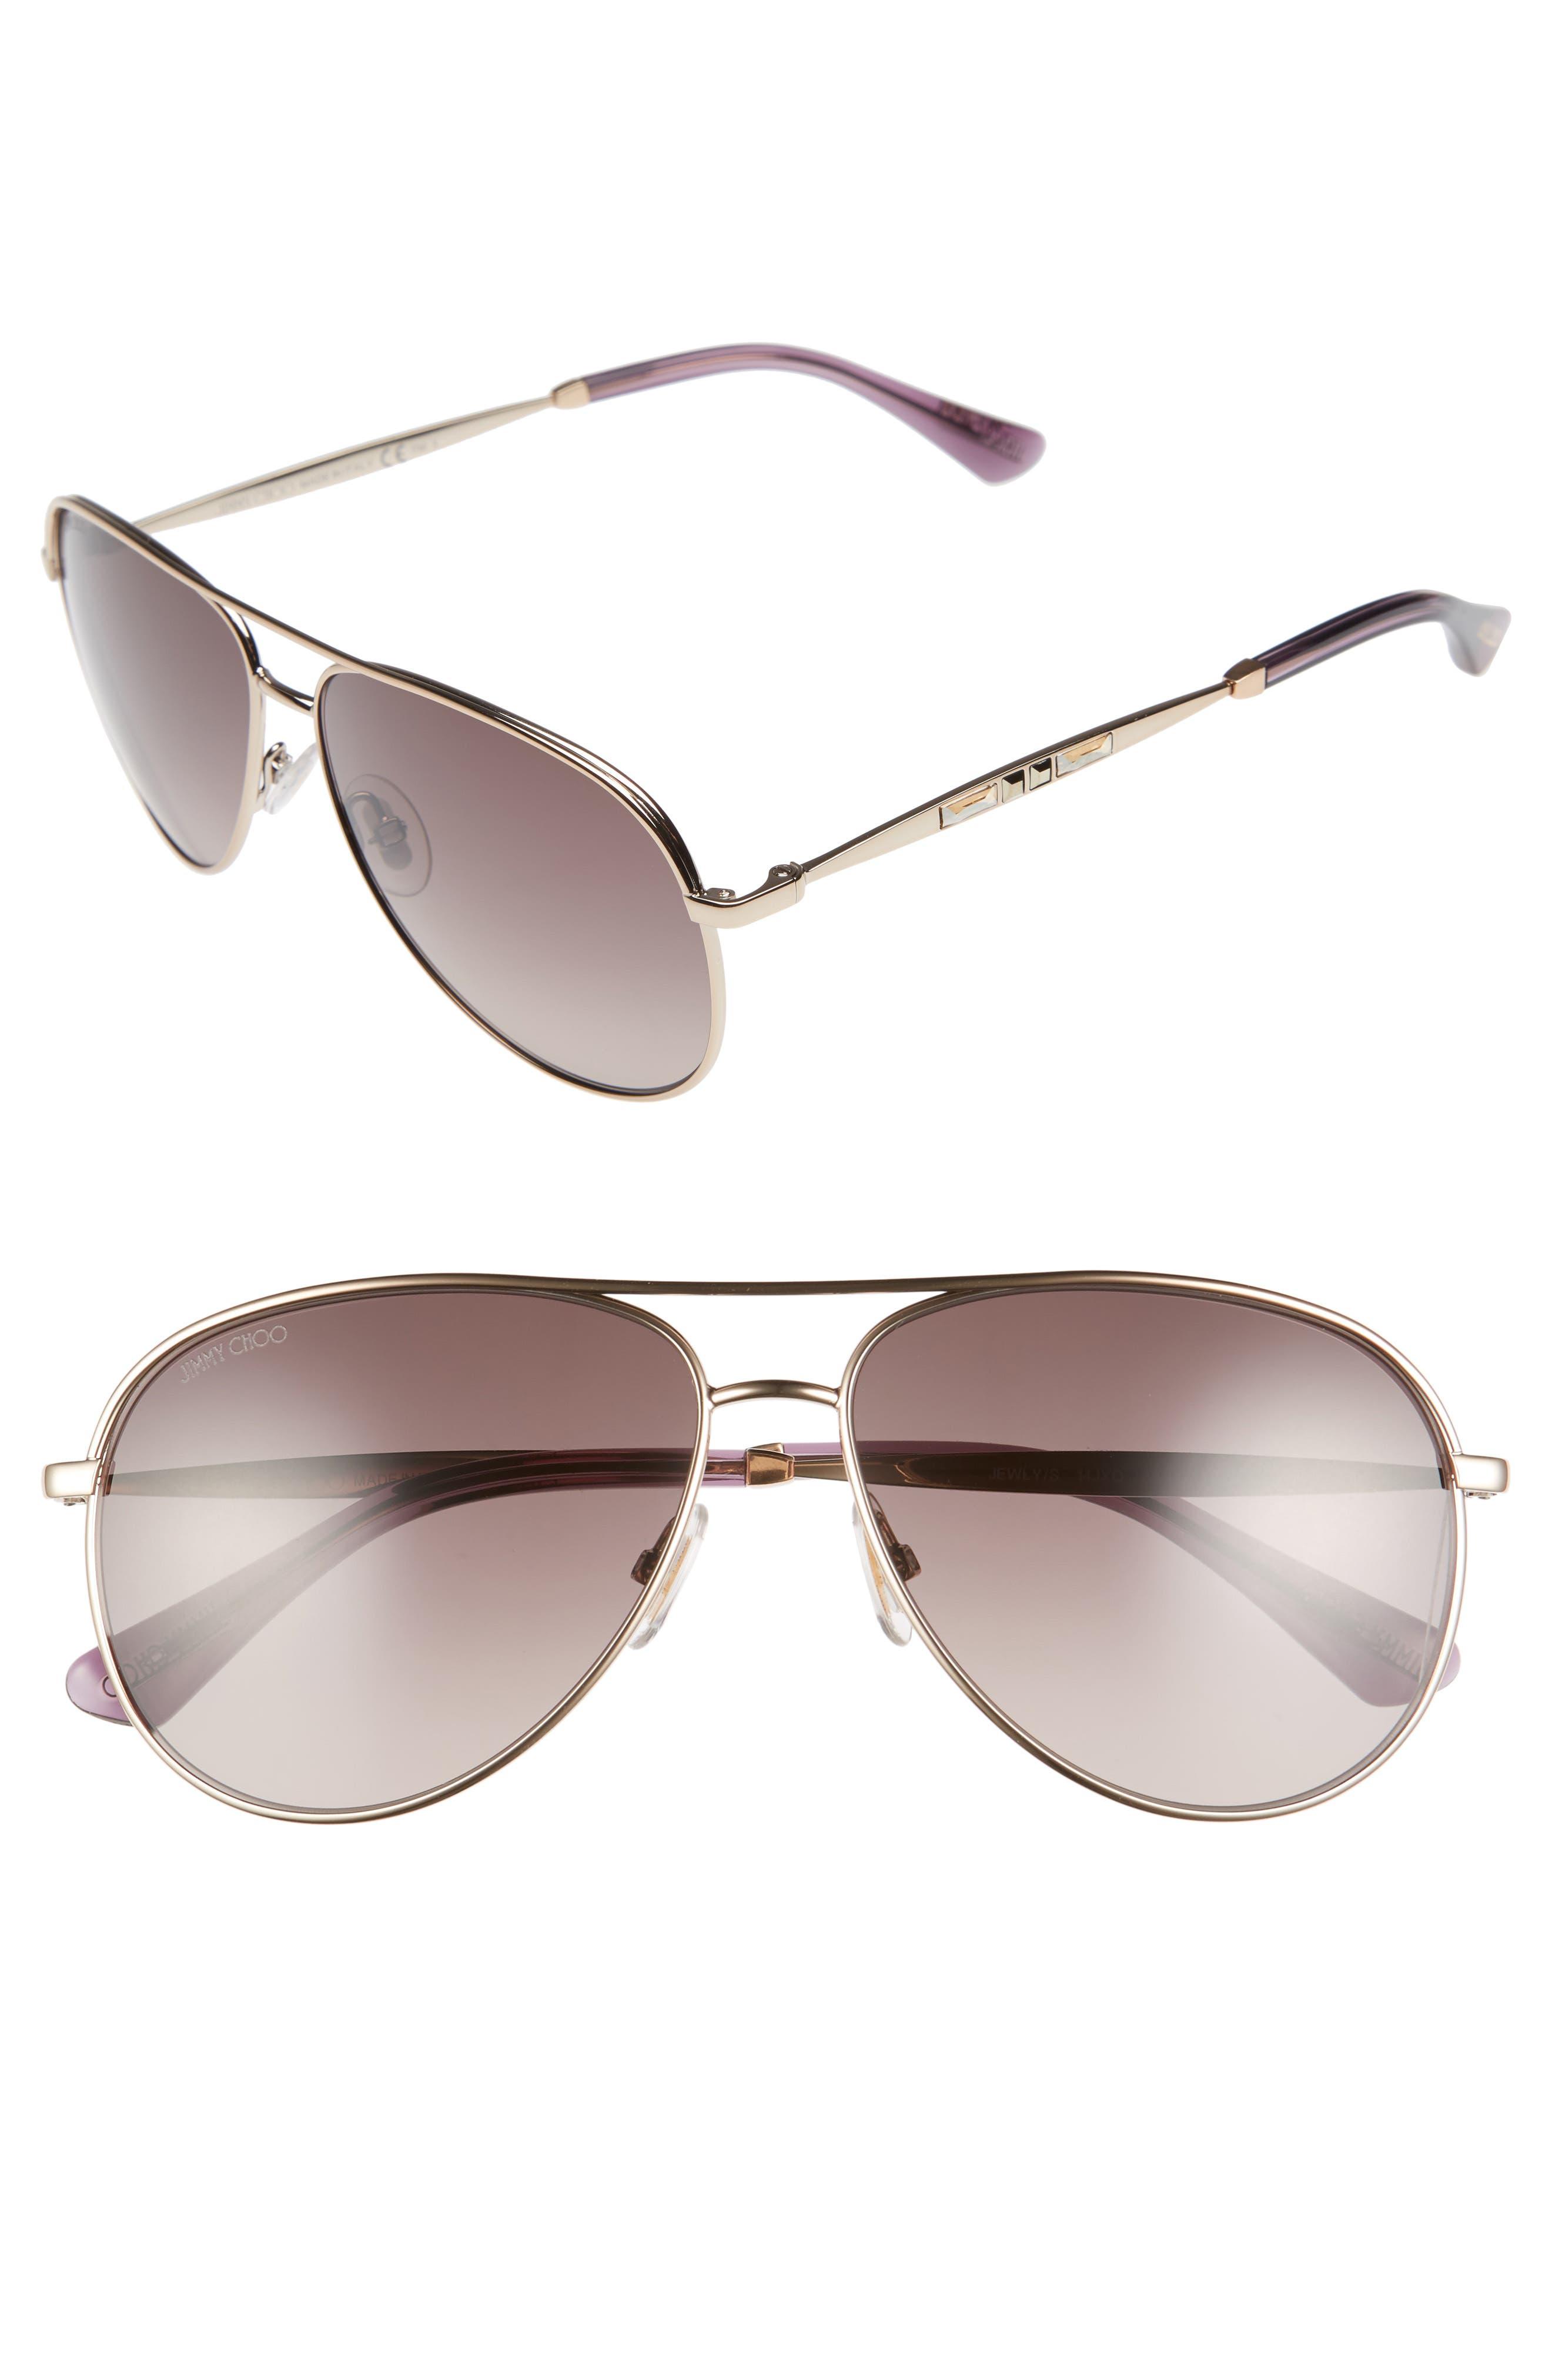 Jewlys 58mm Aviator Sunglasses,                         Main,                         color, 220